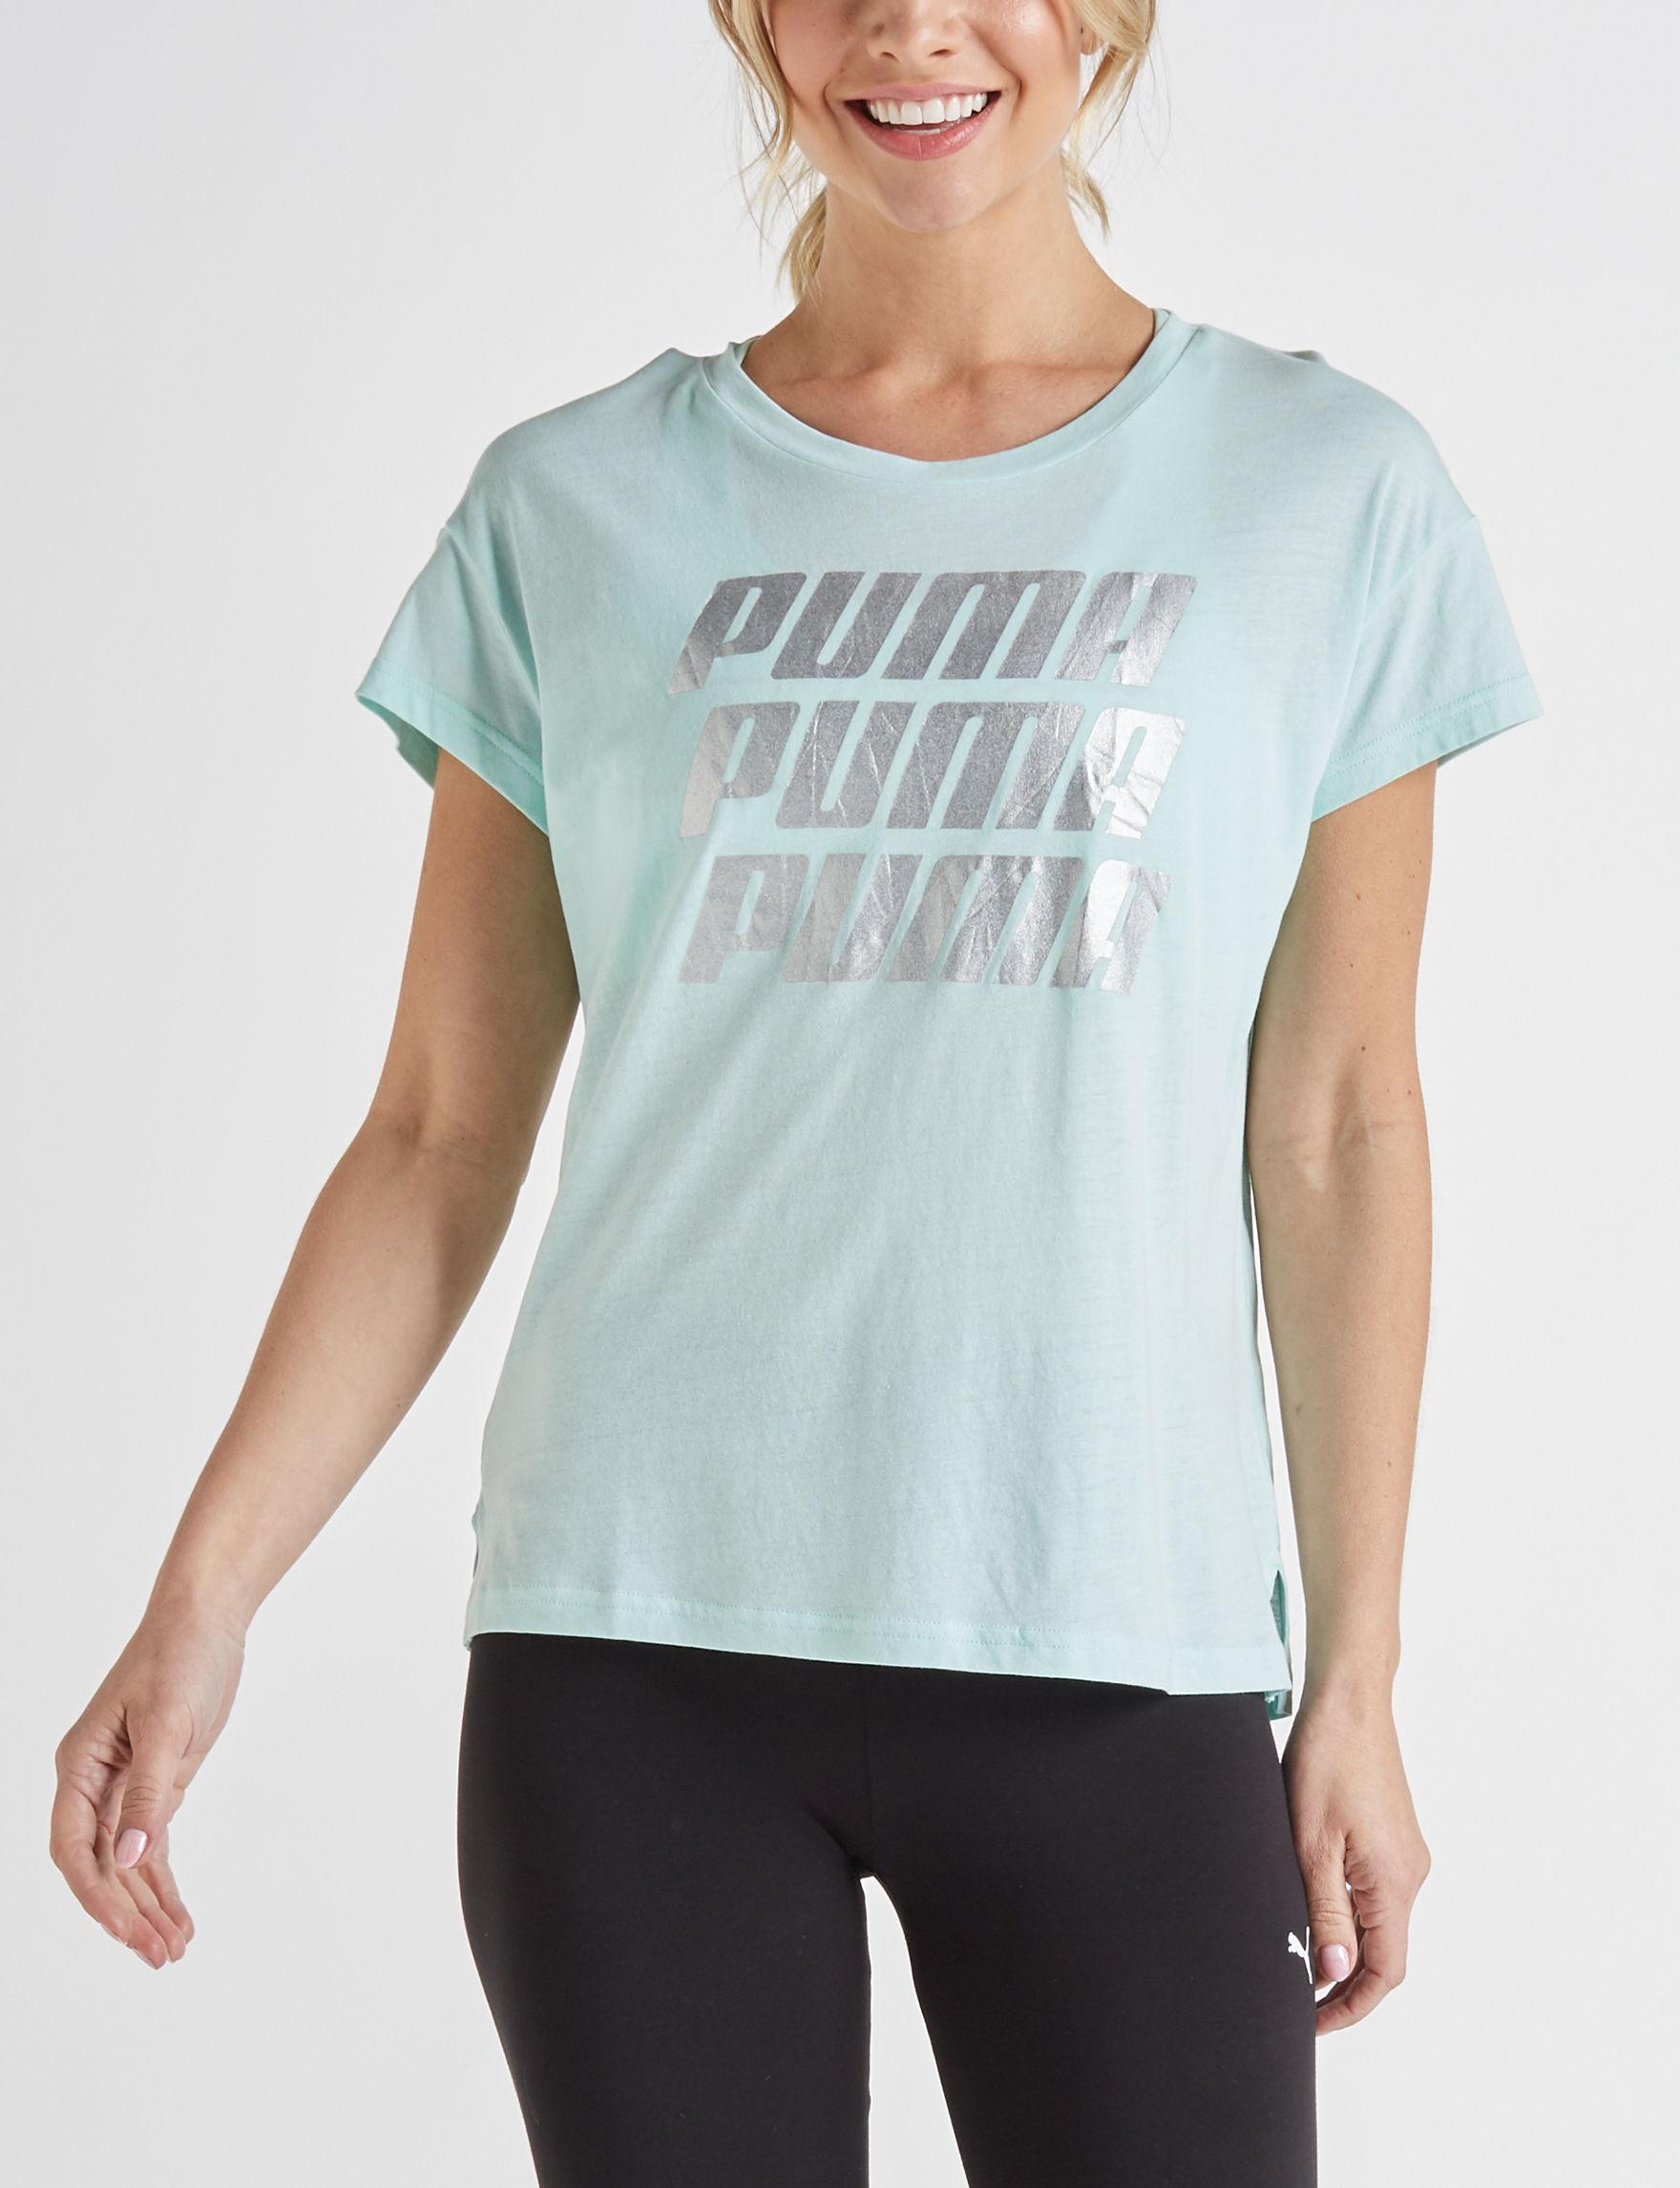 Puma Mint Tees & Tanks